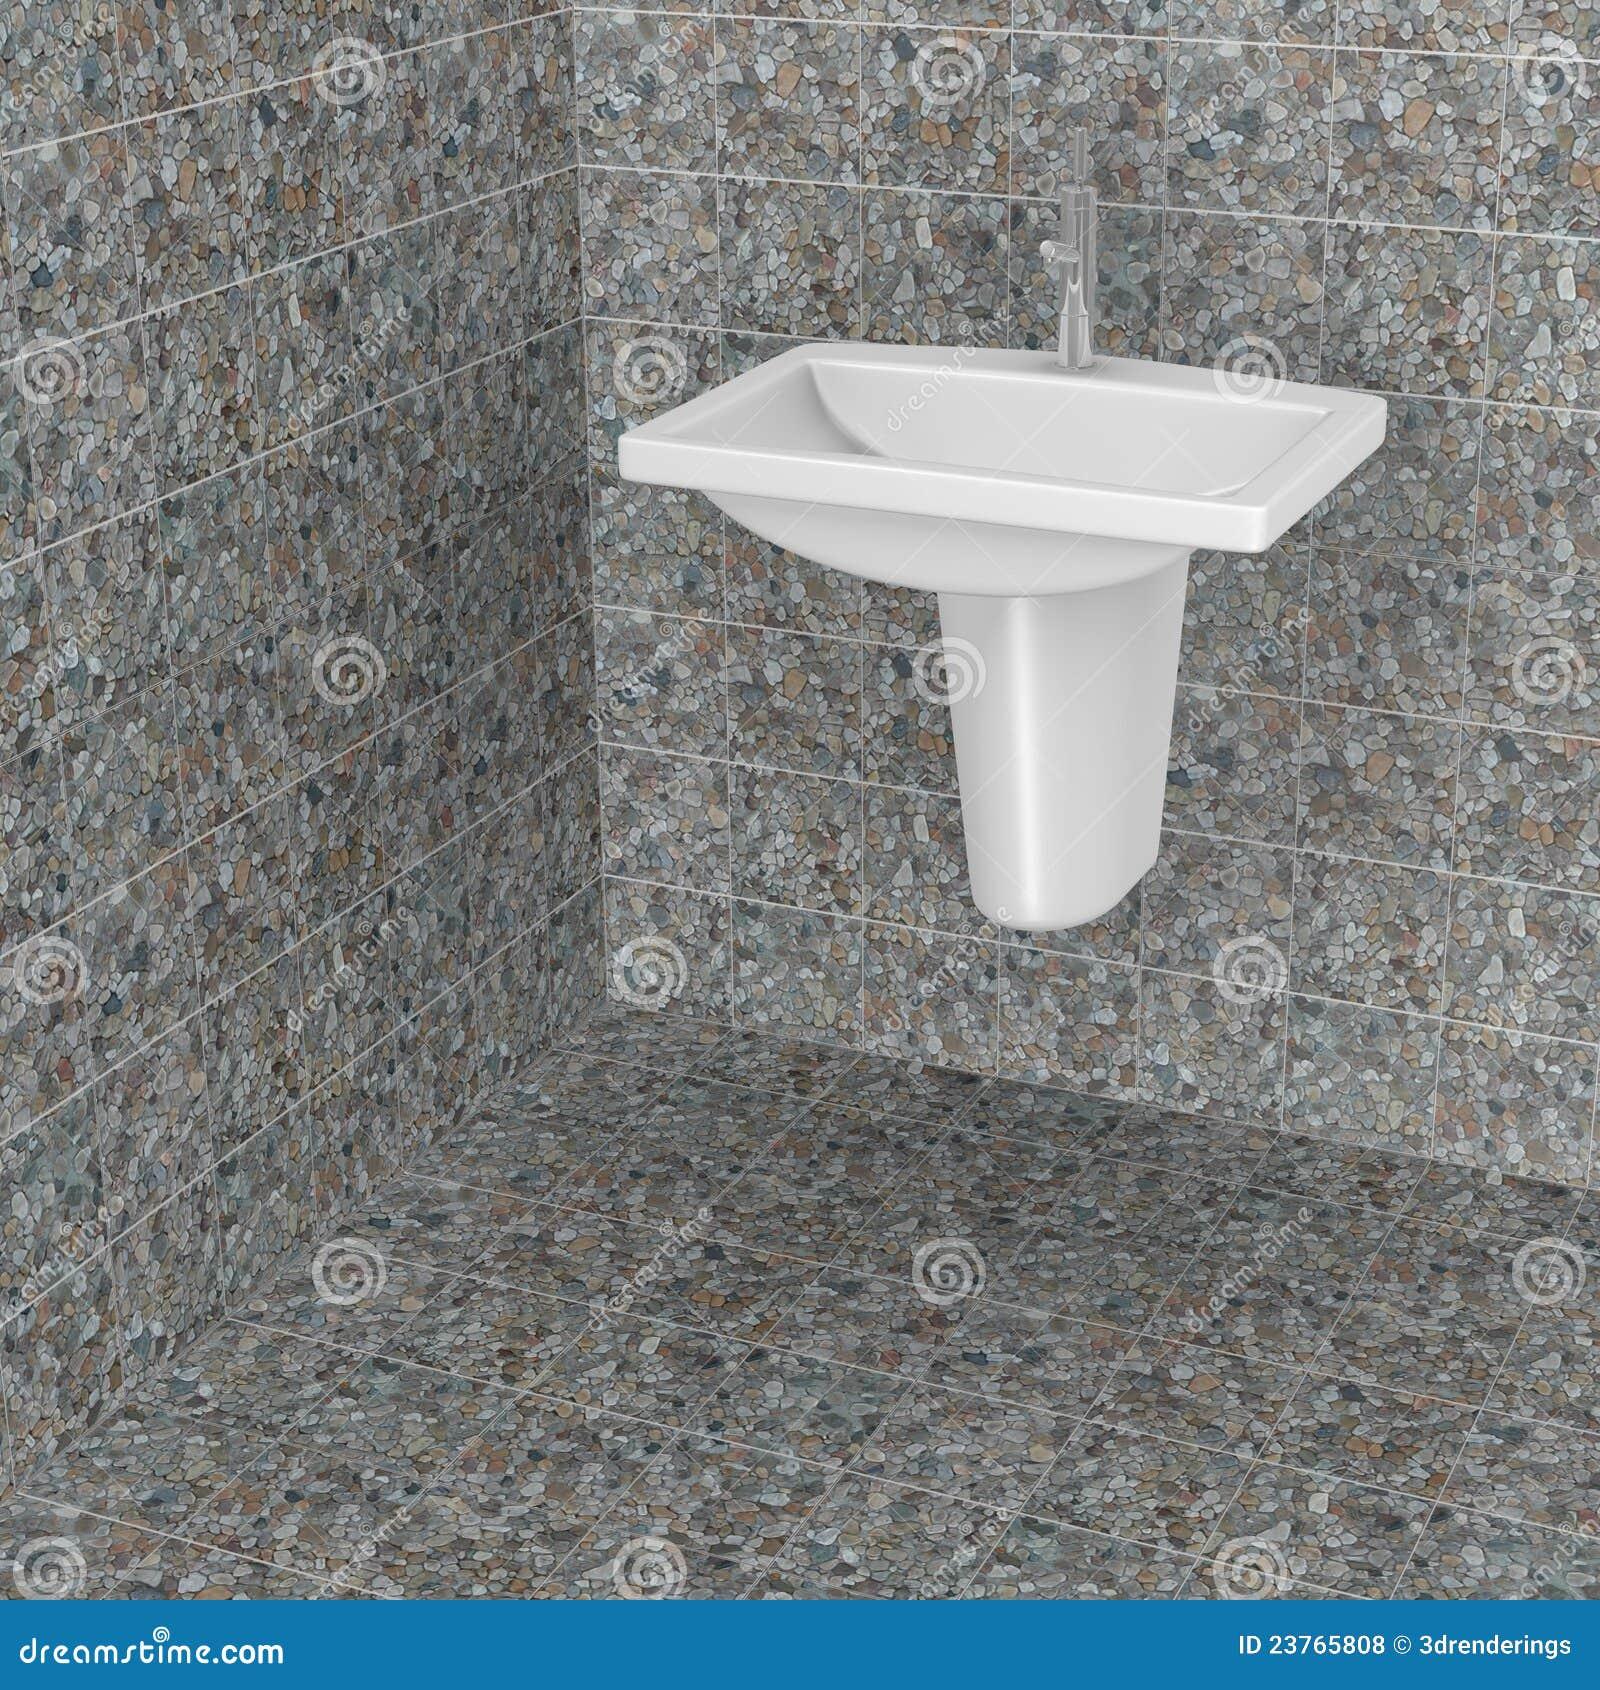 Azulejos Baño Piedra:Bathroom Tile with Stone